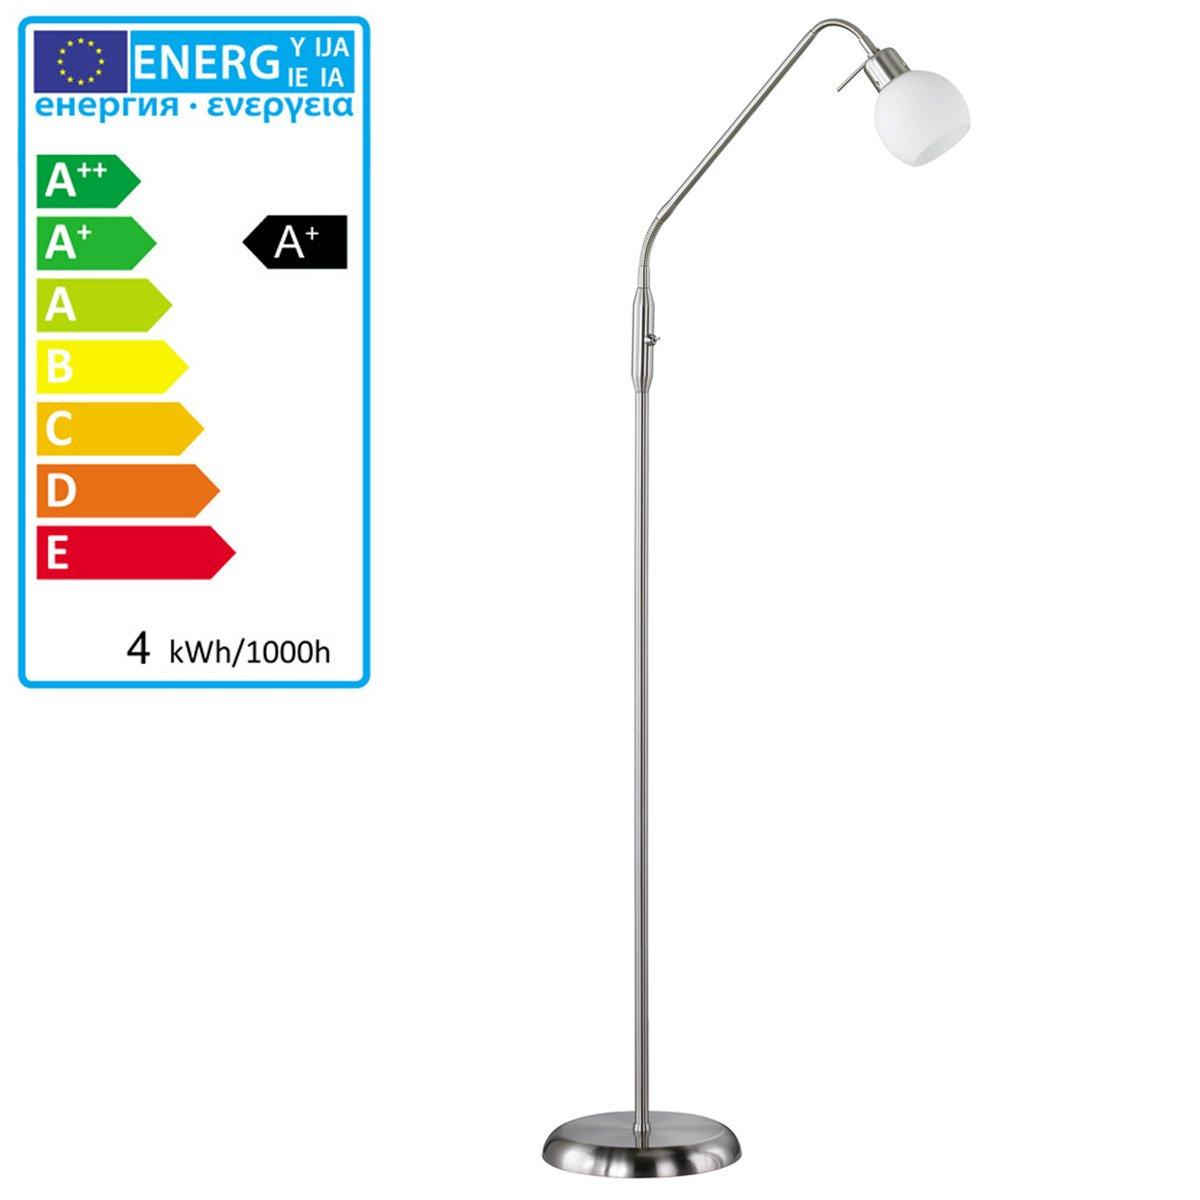 L mpara de pie para iluminaci n led con brazo flexible - Iluminacion con led ...